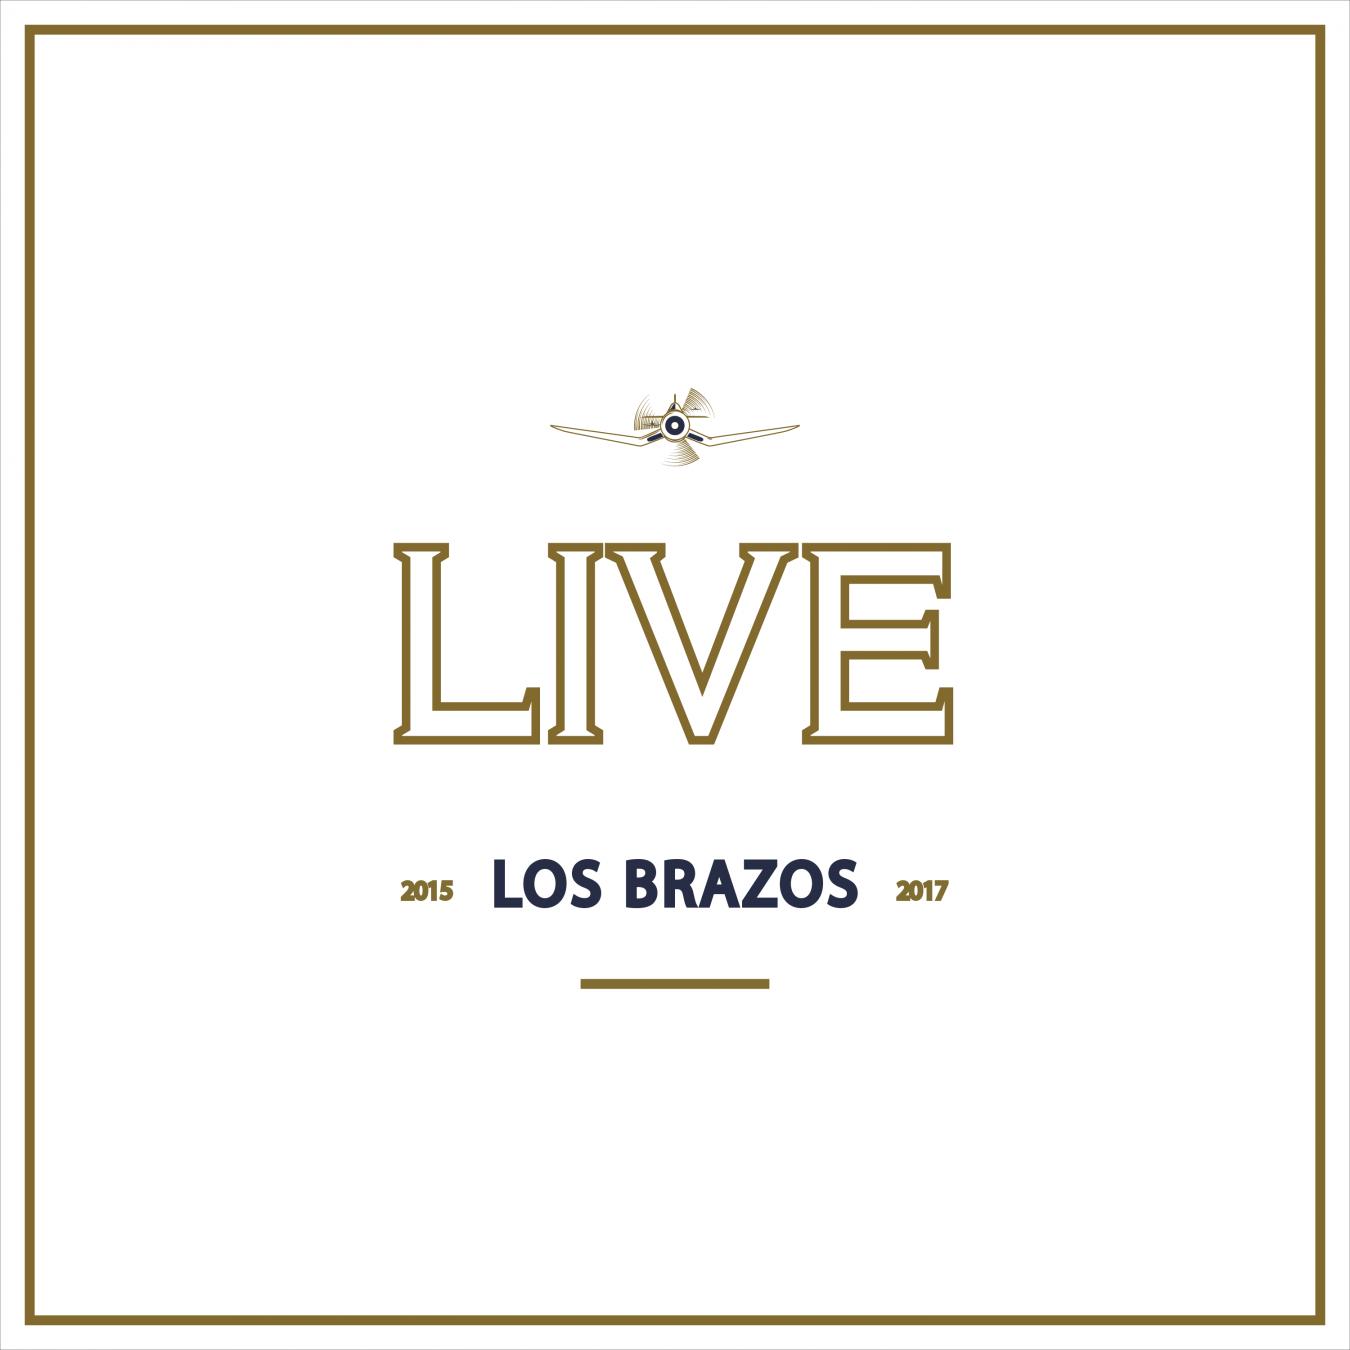 Portada-Los-Brazos-LIVE-3000-px-01-1350x1350.png